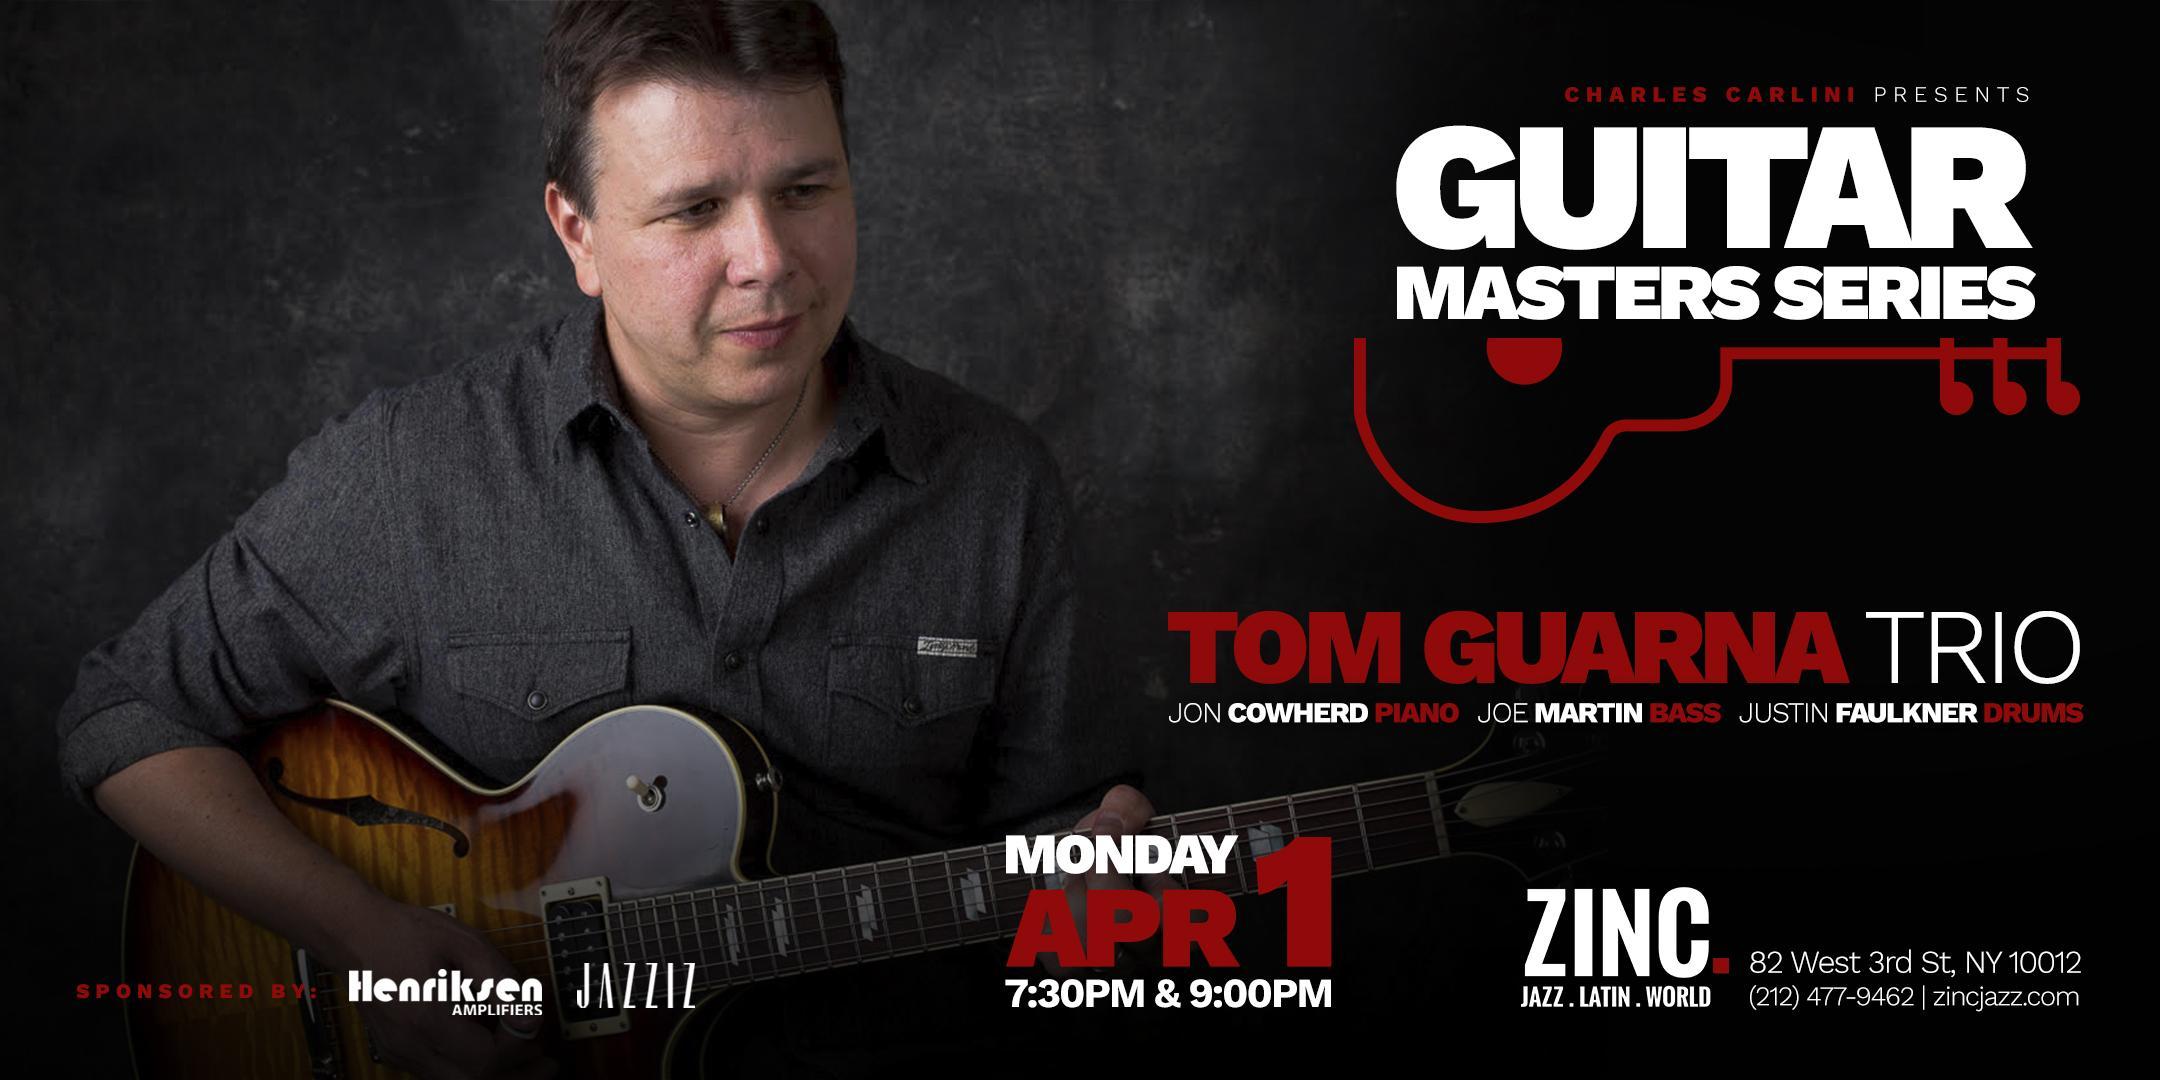 Guitar Masters Series: Tom Guarna Quartet